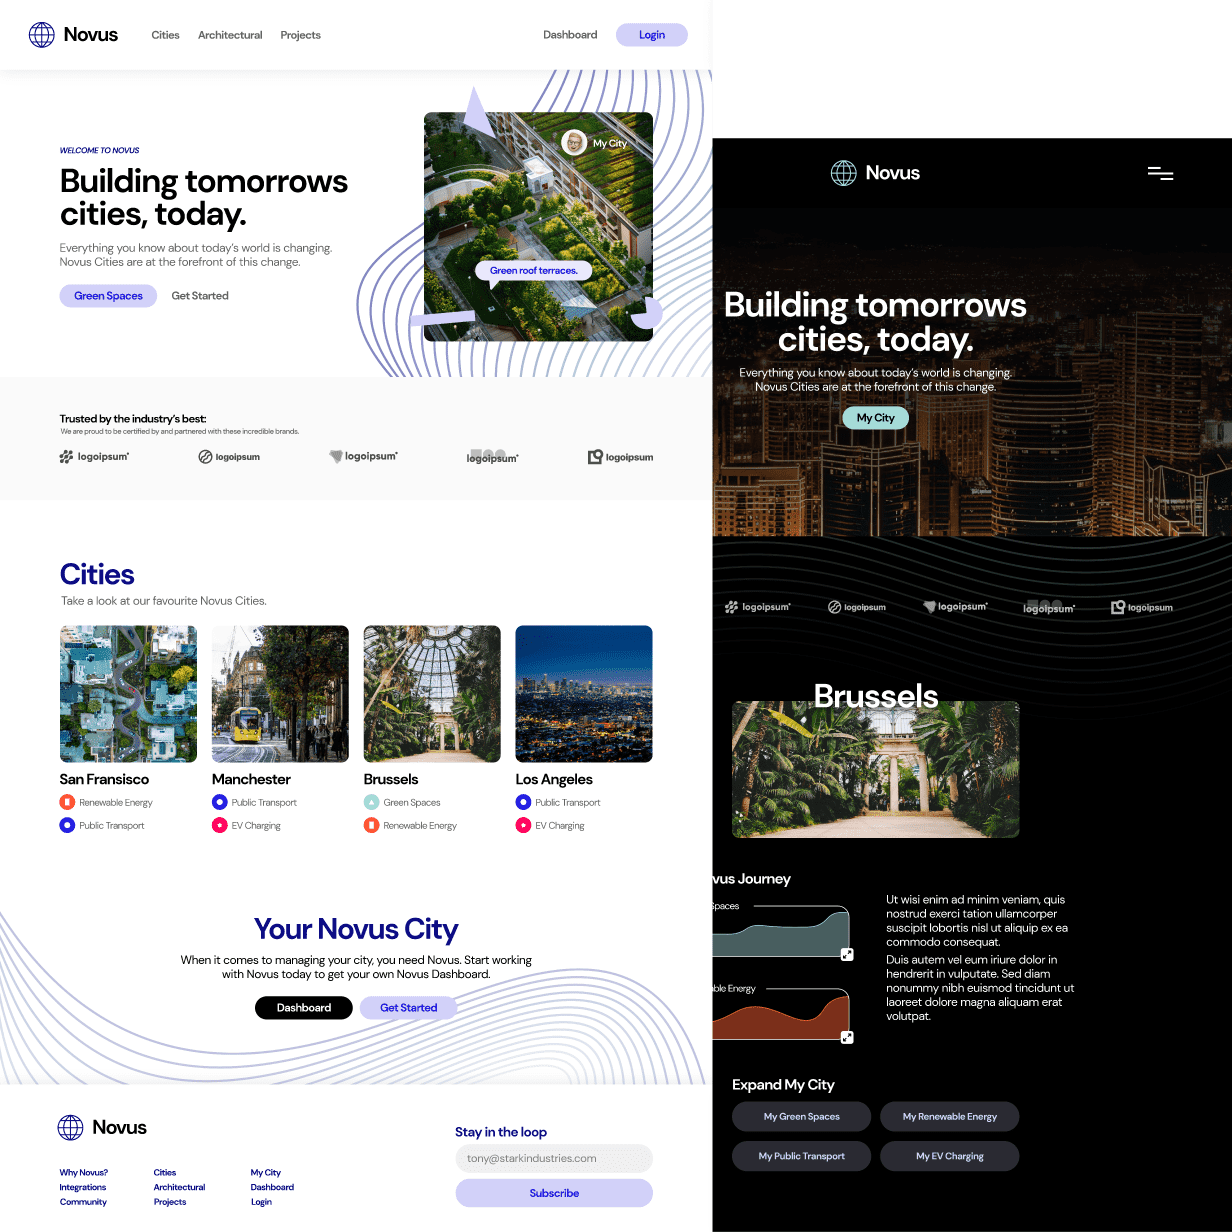 website design mockup of green energy for cities